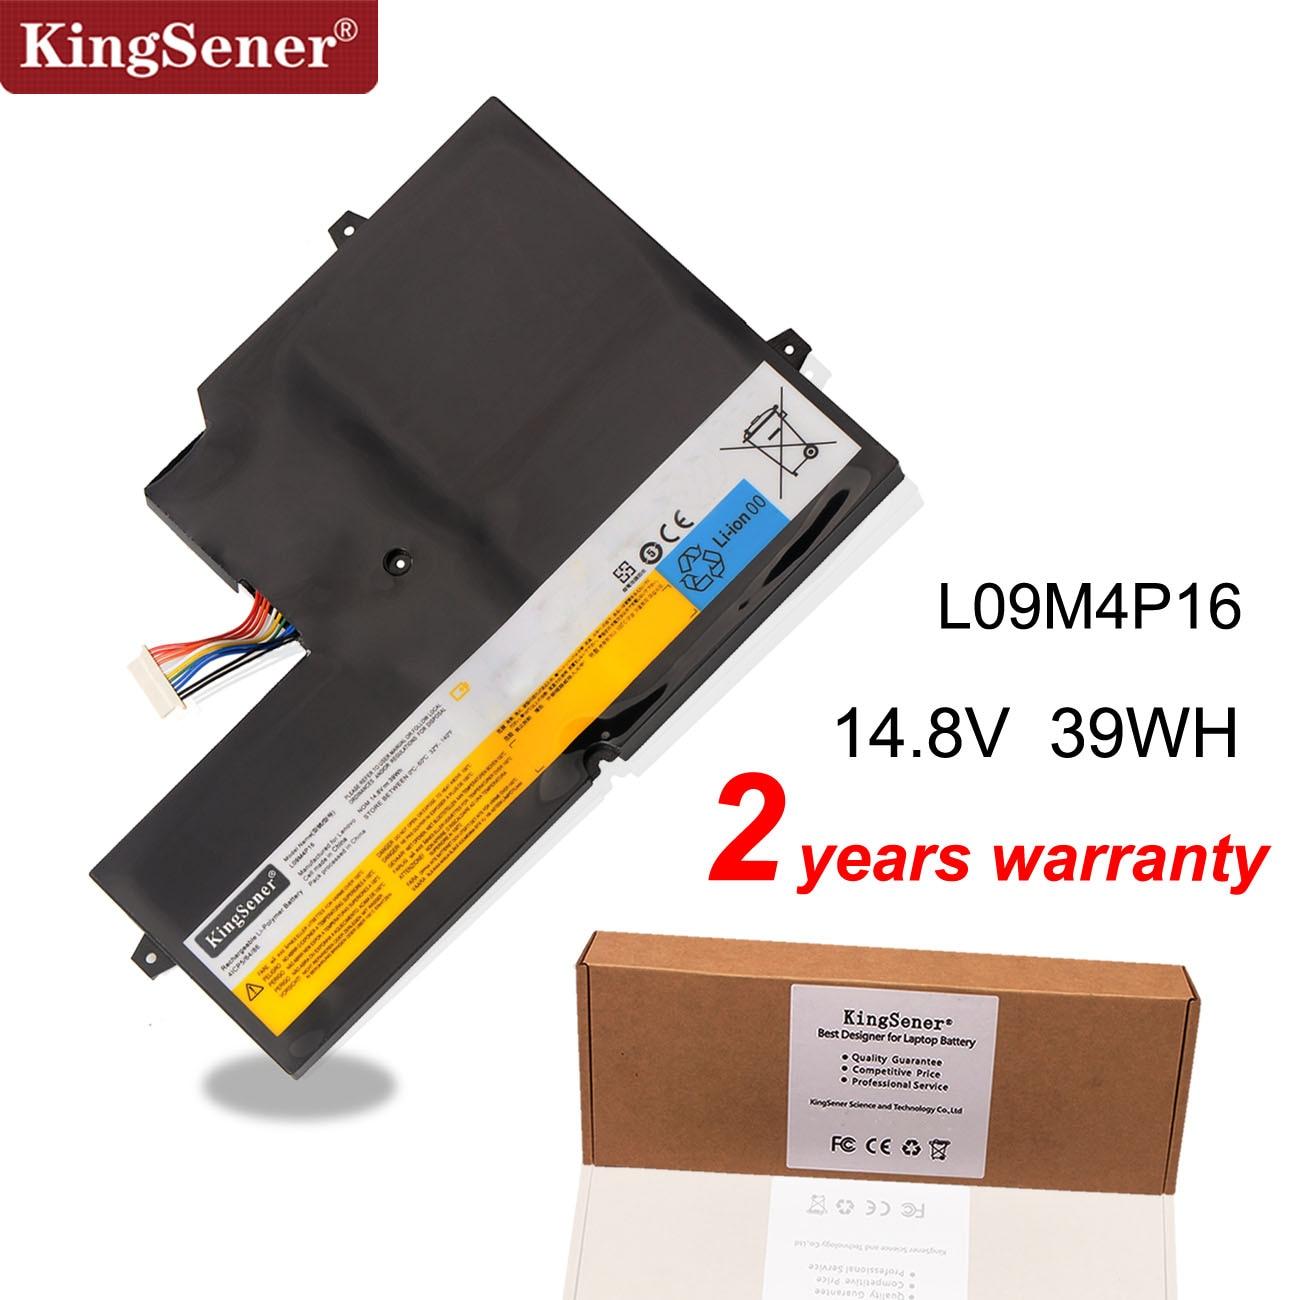 KingSener New L09M4P16 Laptop Battery For Lenovo For IdeaPad U260 Series L09M4P16 57Y6601 KB3072 14.8V 39WH